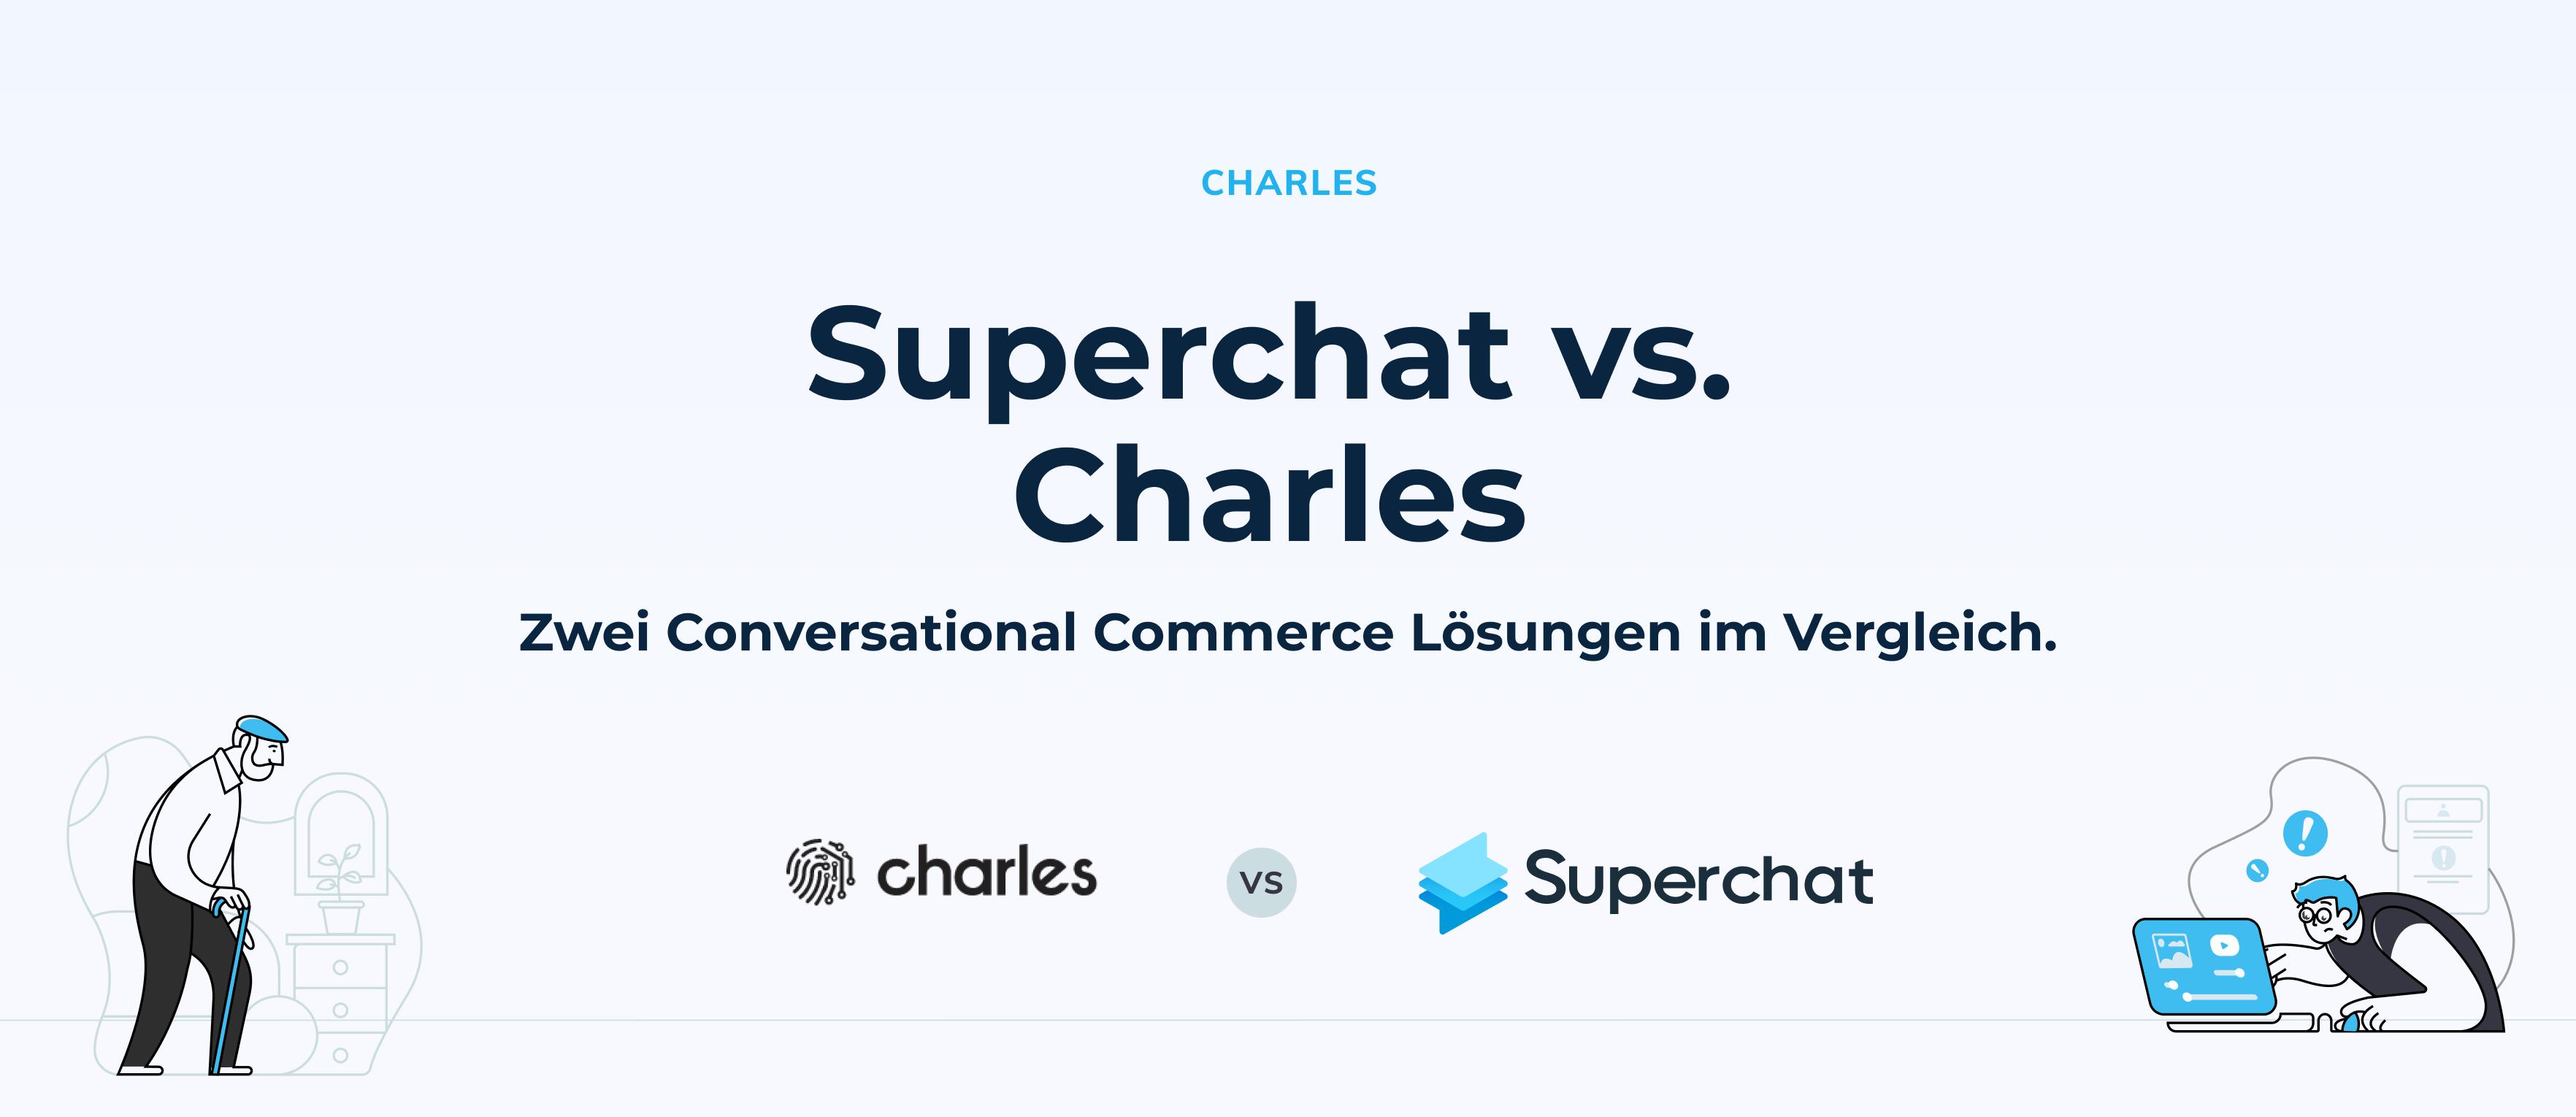 Superchat im Vergleich: Superchat vs. Charles